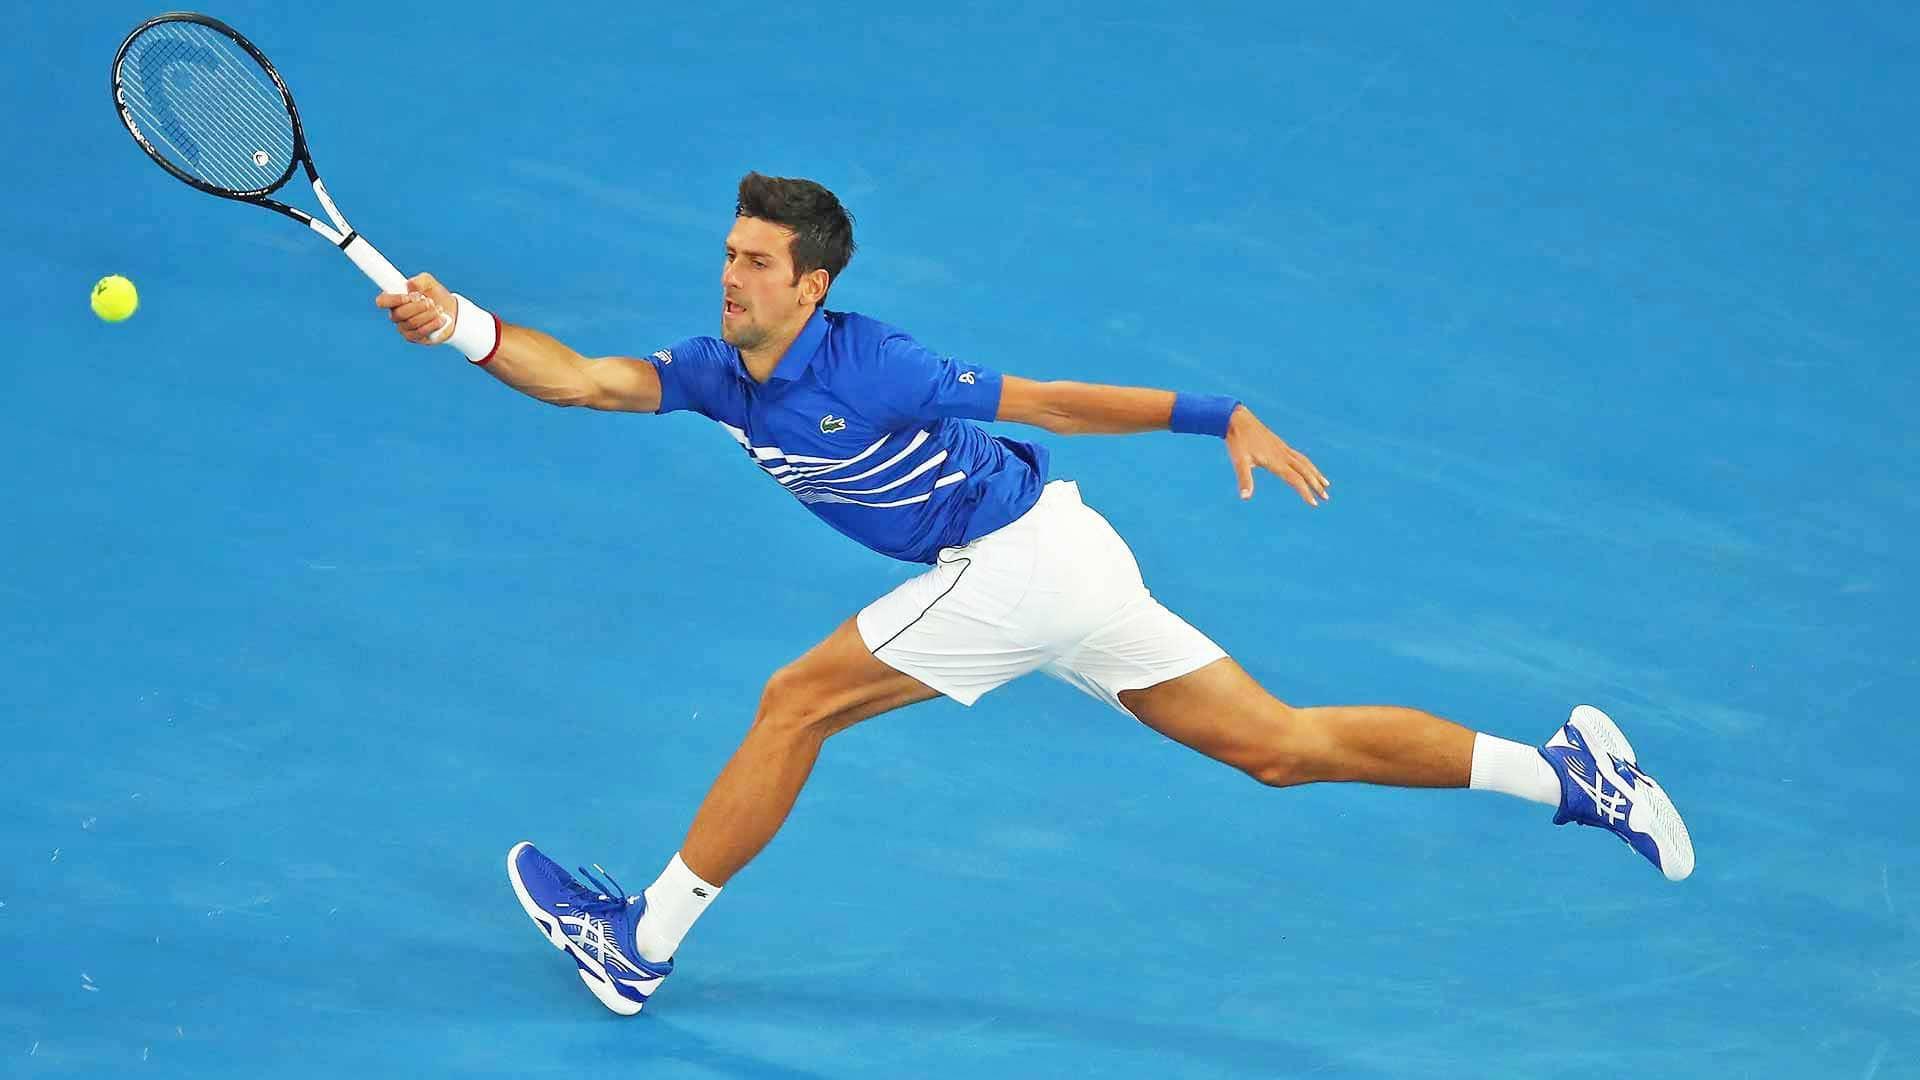 Novak Djokovic, Daniil Medvedev Formed One Of Best Rivalries Of 2019 ATP Tour Season   ATP Tour   Tennis